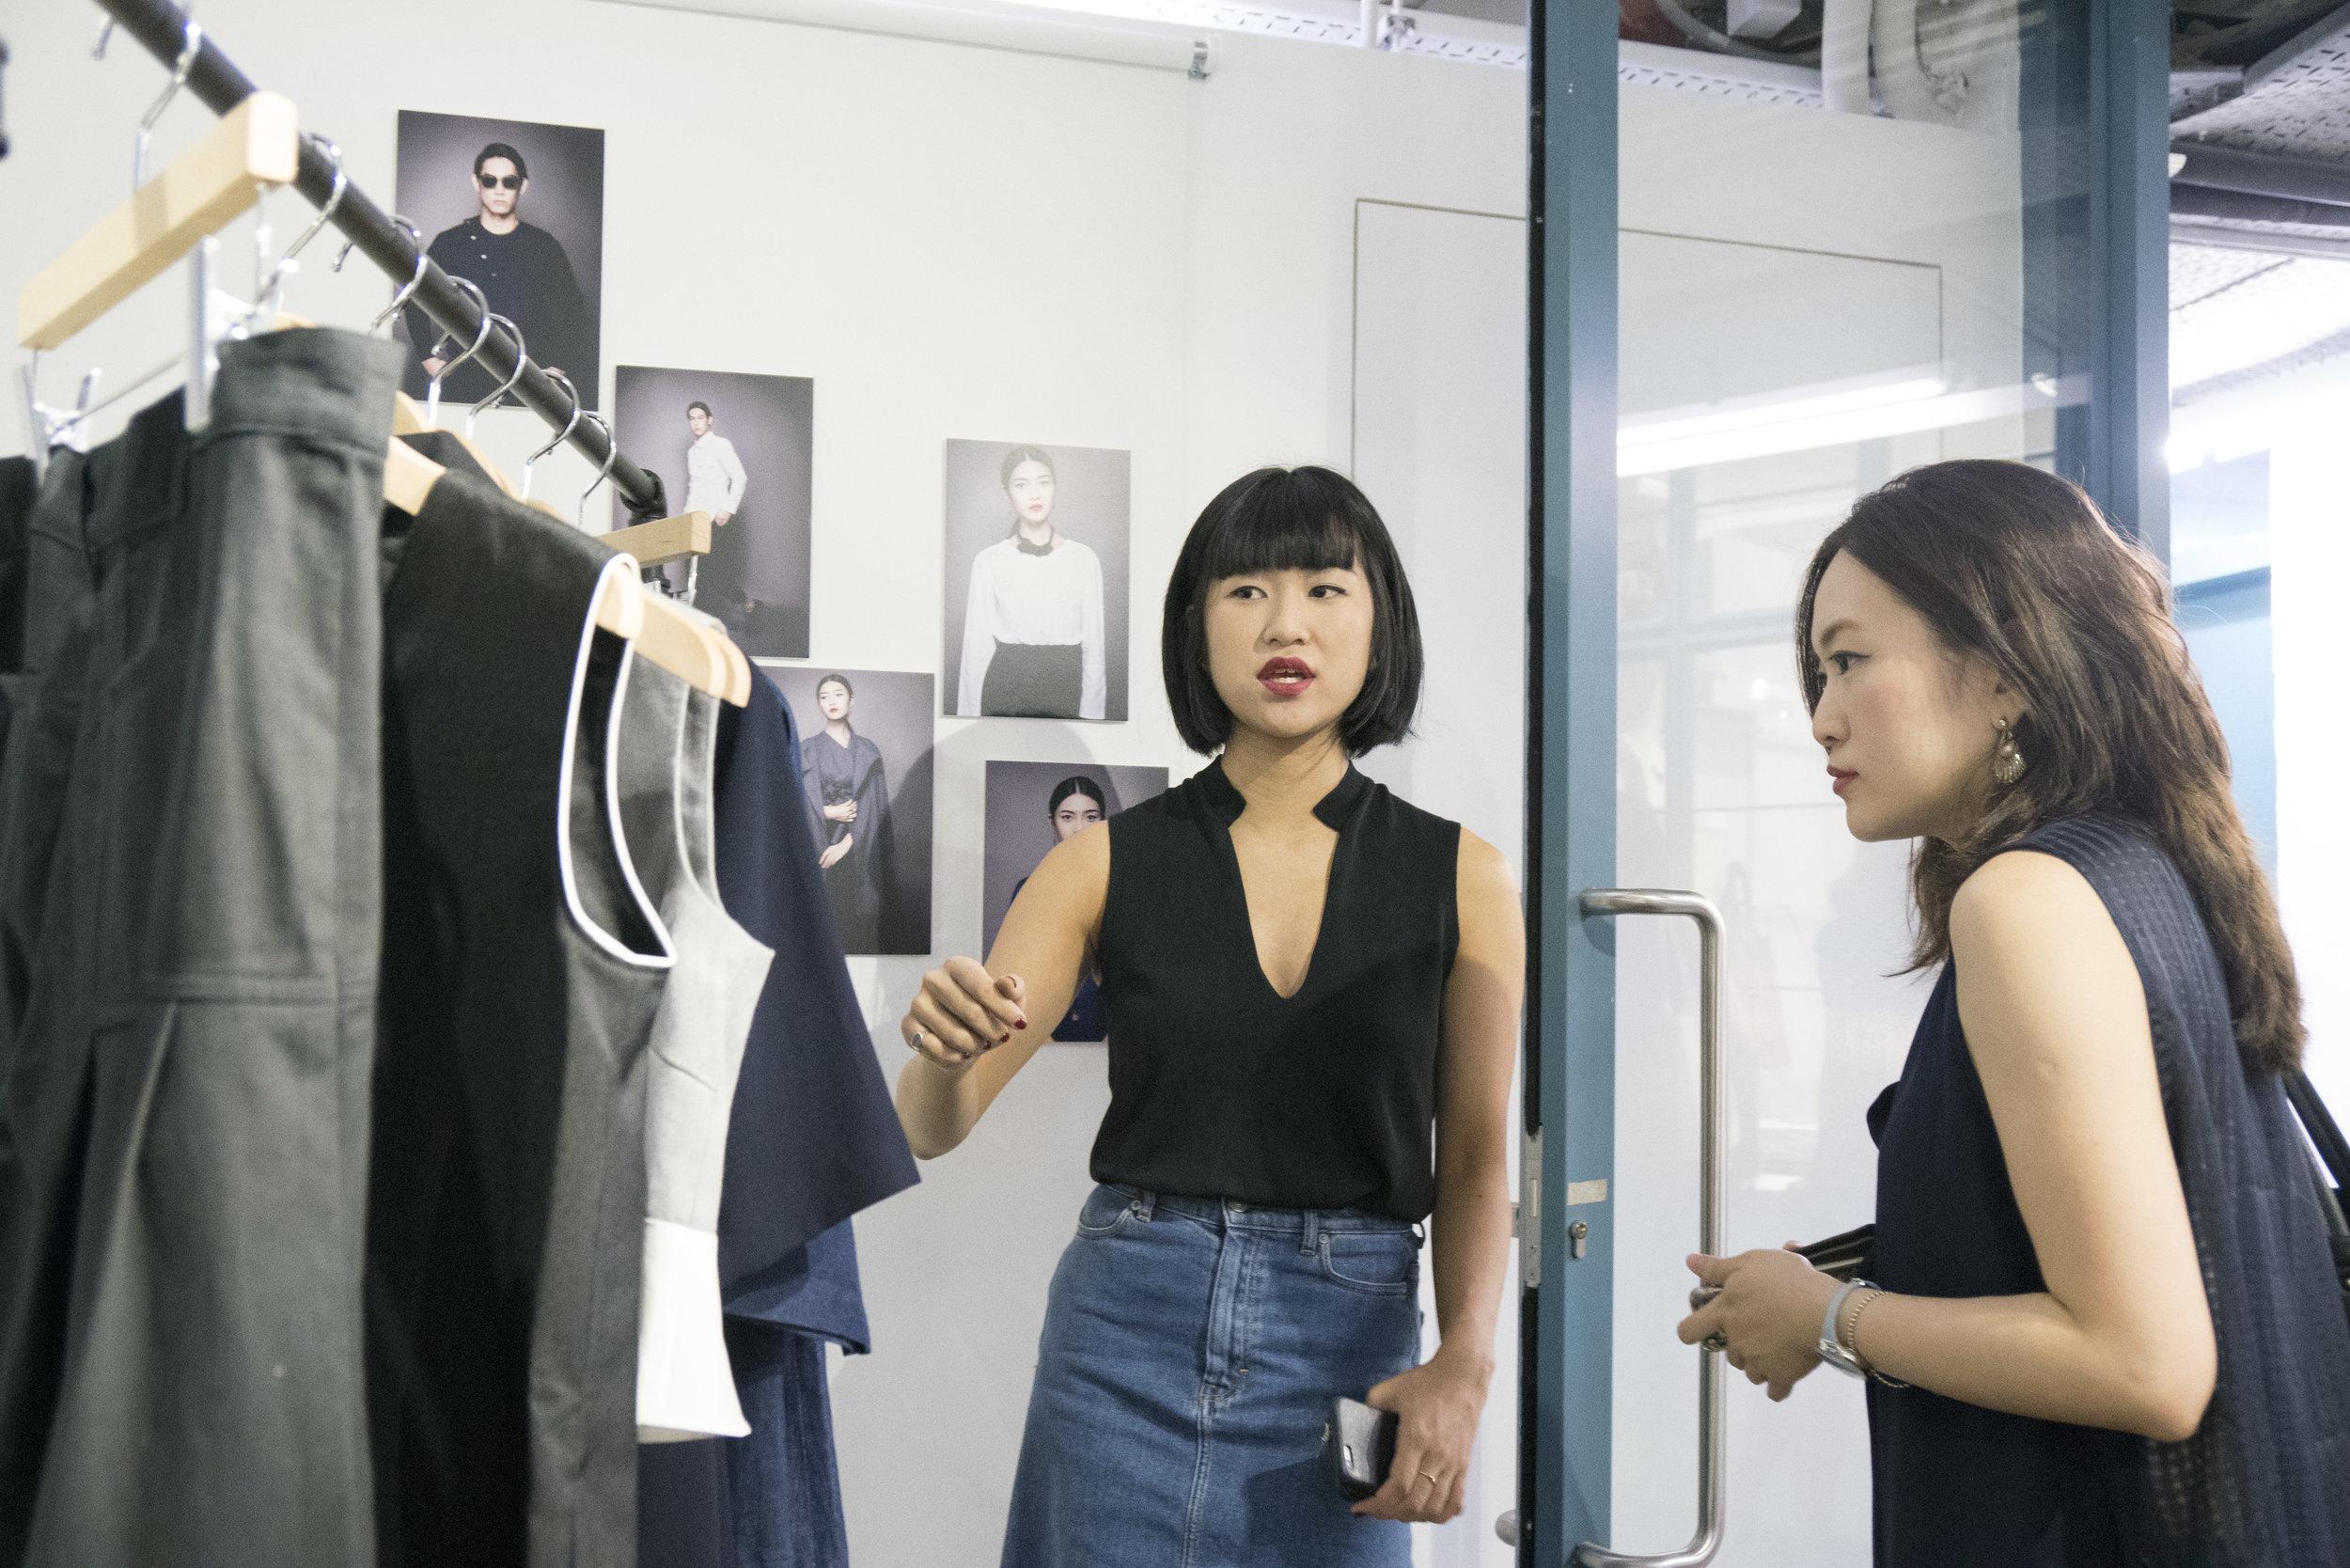 kapok x The EcoChic Design Award Alumni prize sustainable showcase launch event_Aug 11_Wan and Wong7.JPG